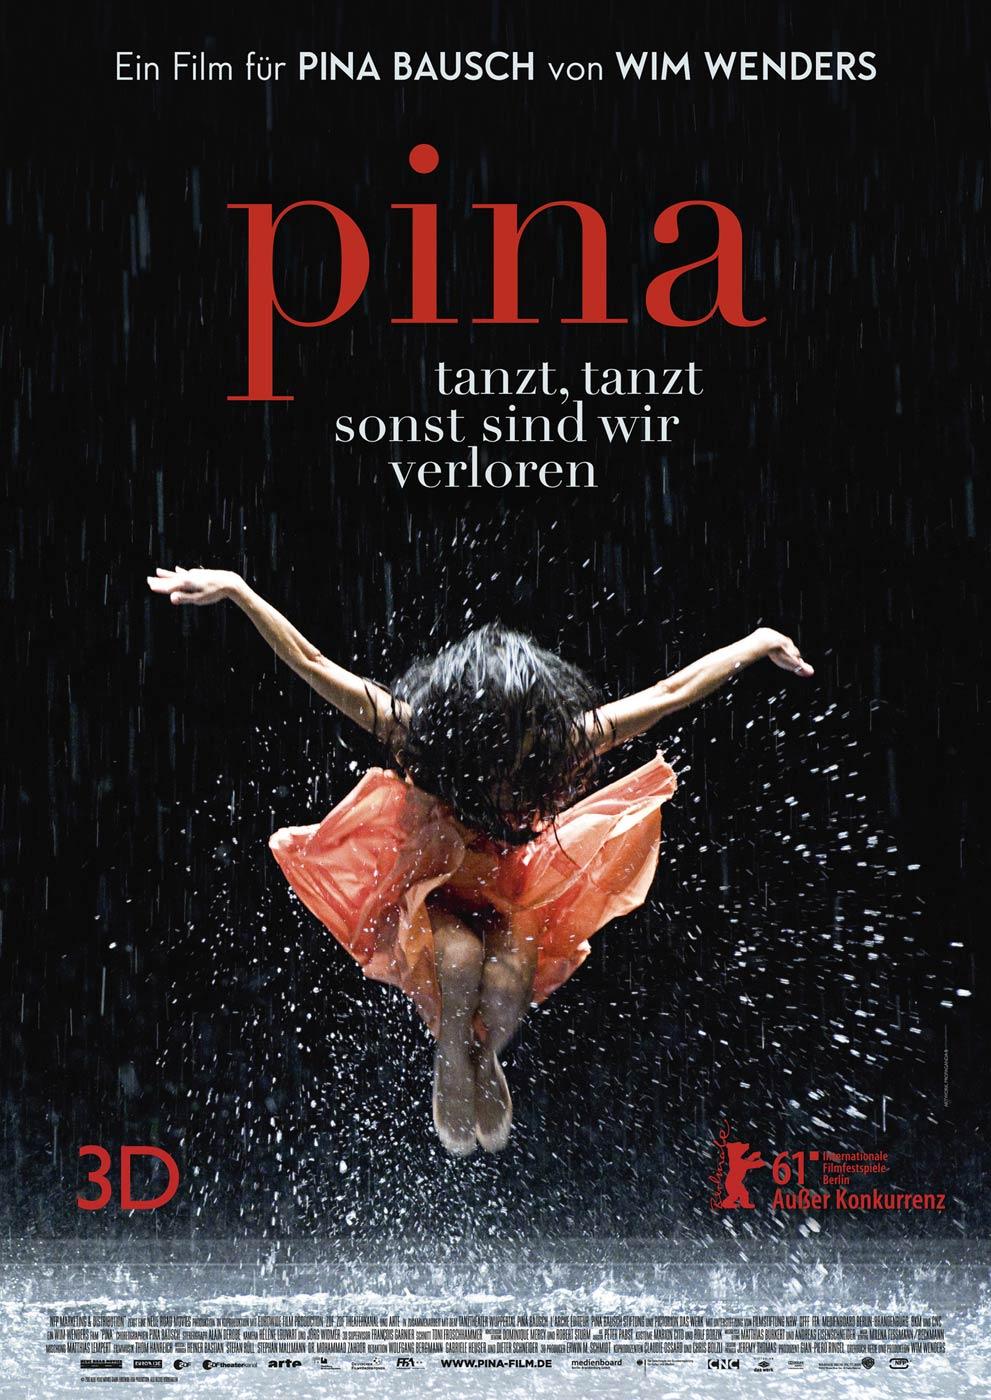 PINA_Poster_01